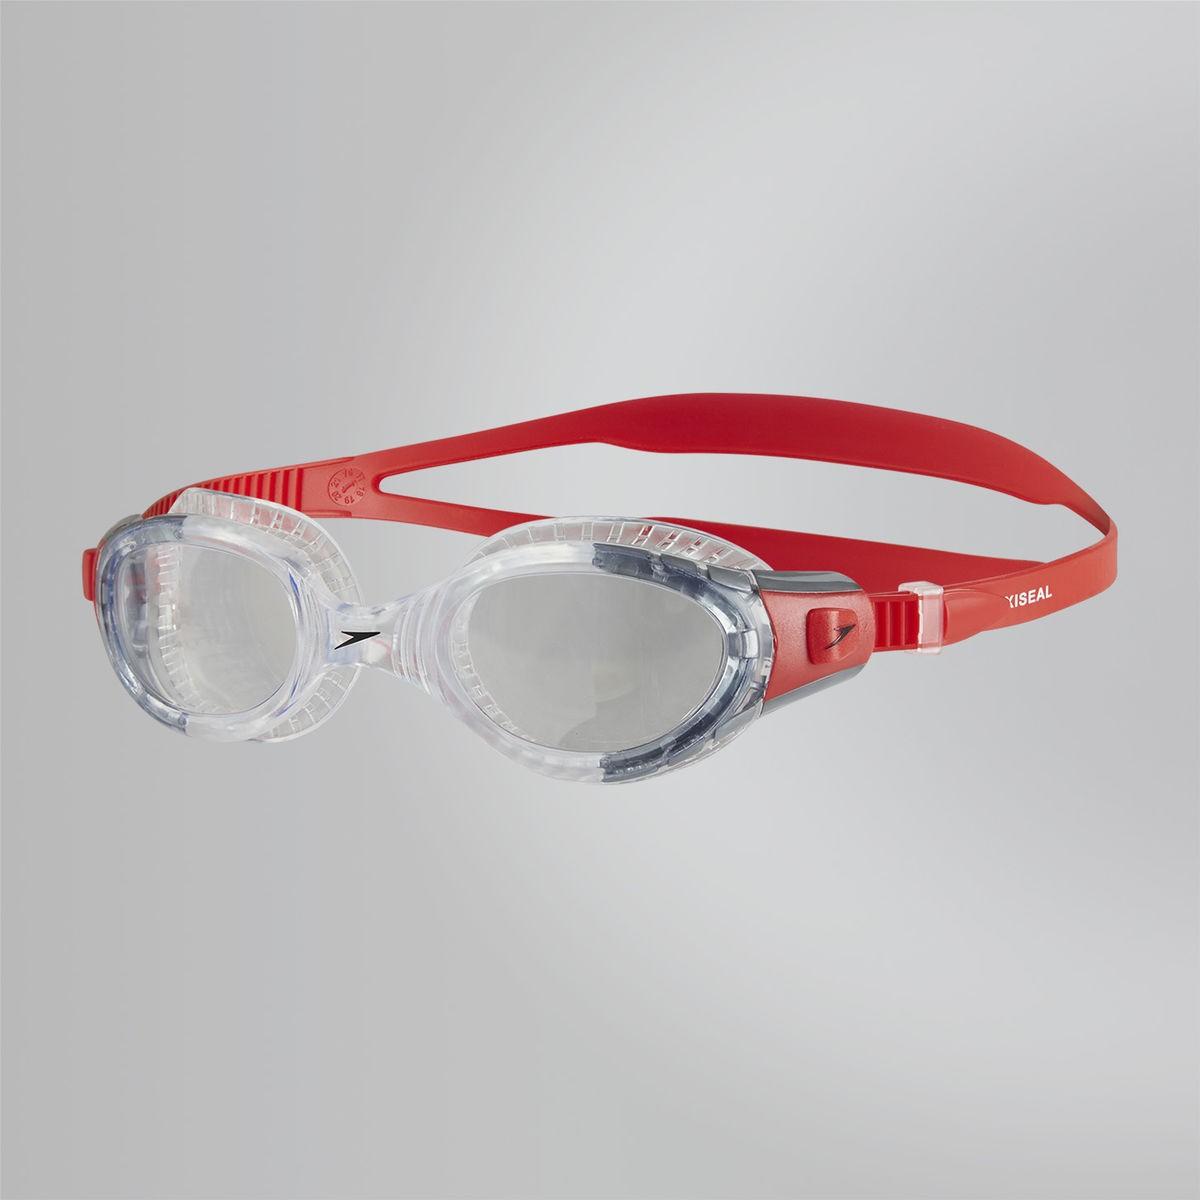 Speedo zwembril Futura Biofuse Flexiseal clear